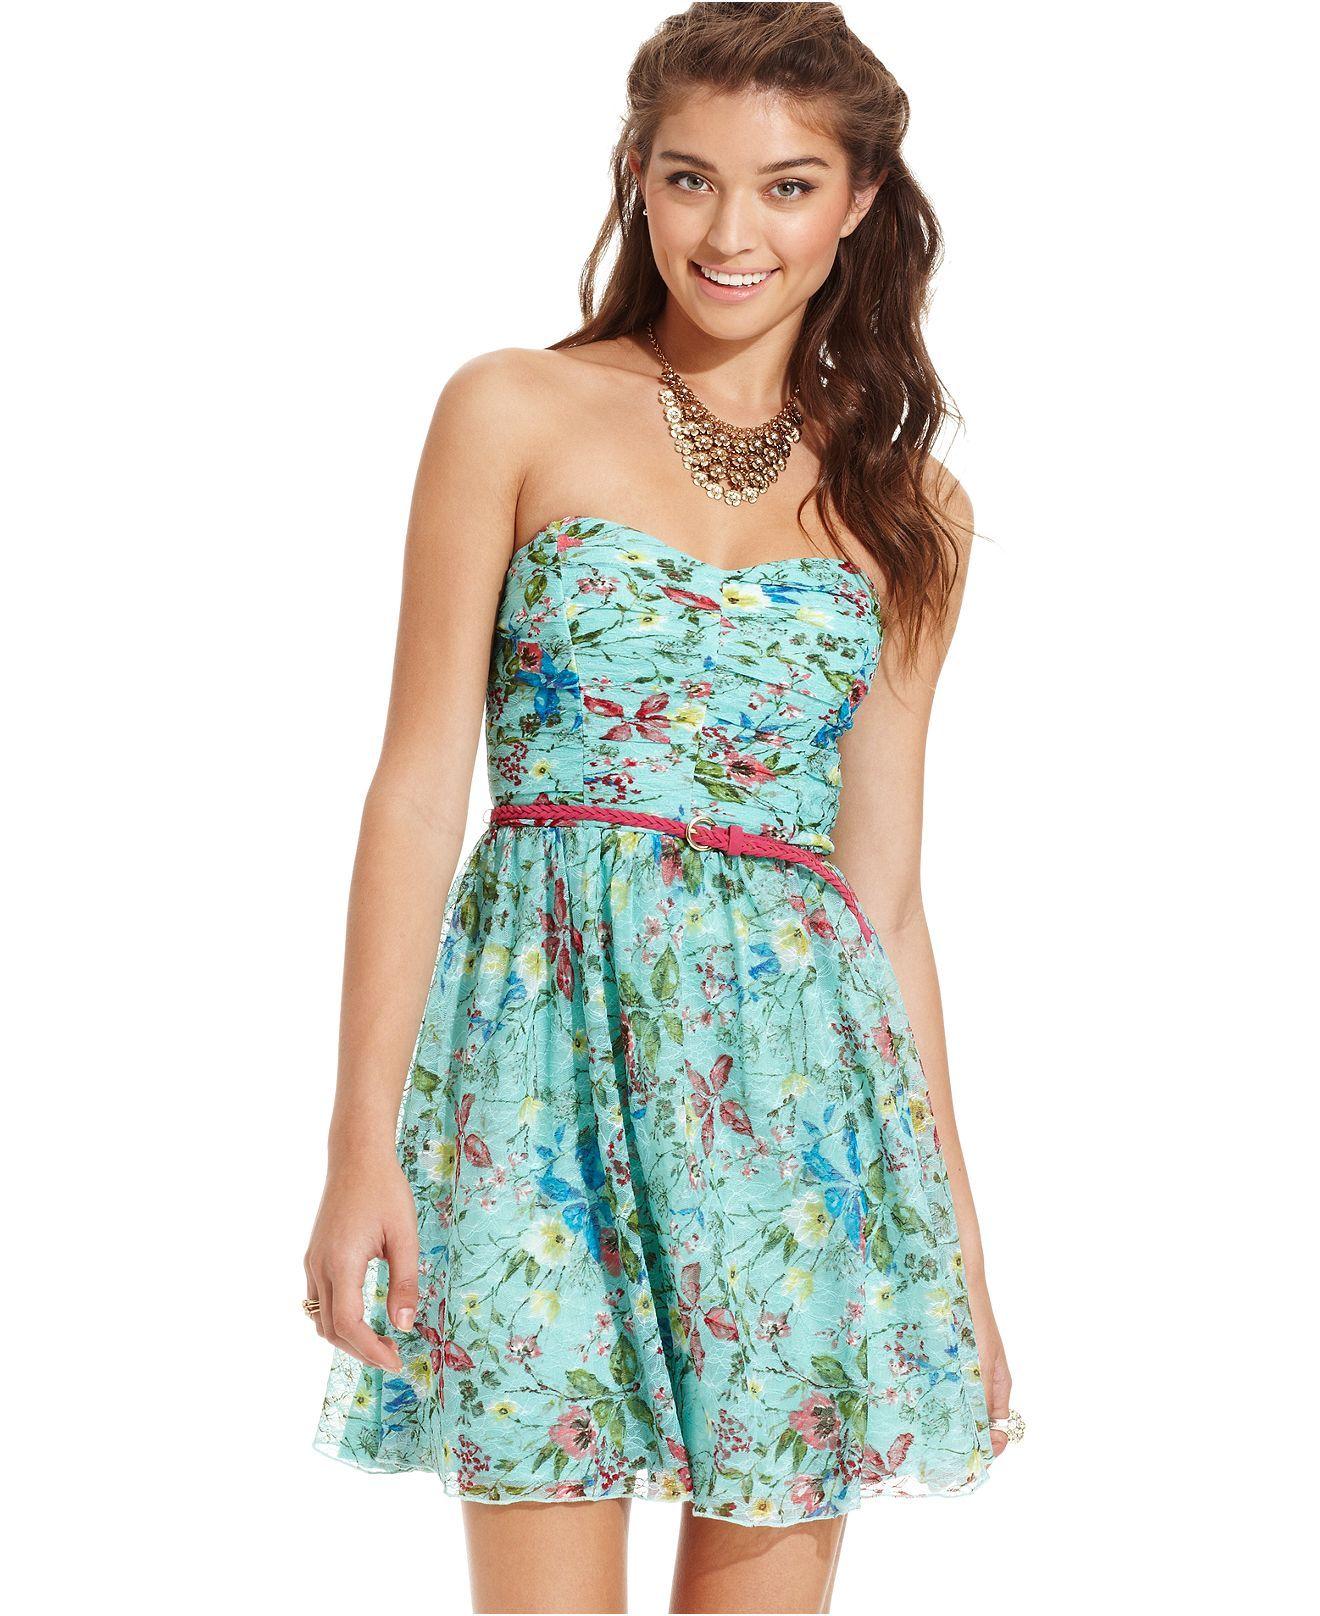 Trixxi Juniors Dress, Strapless Floral-Print A-Line - Juniors ...